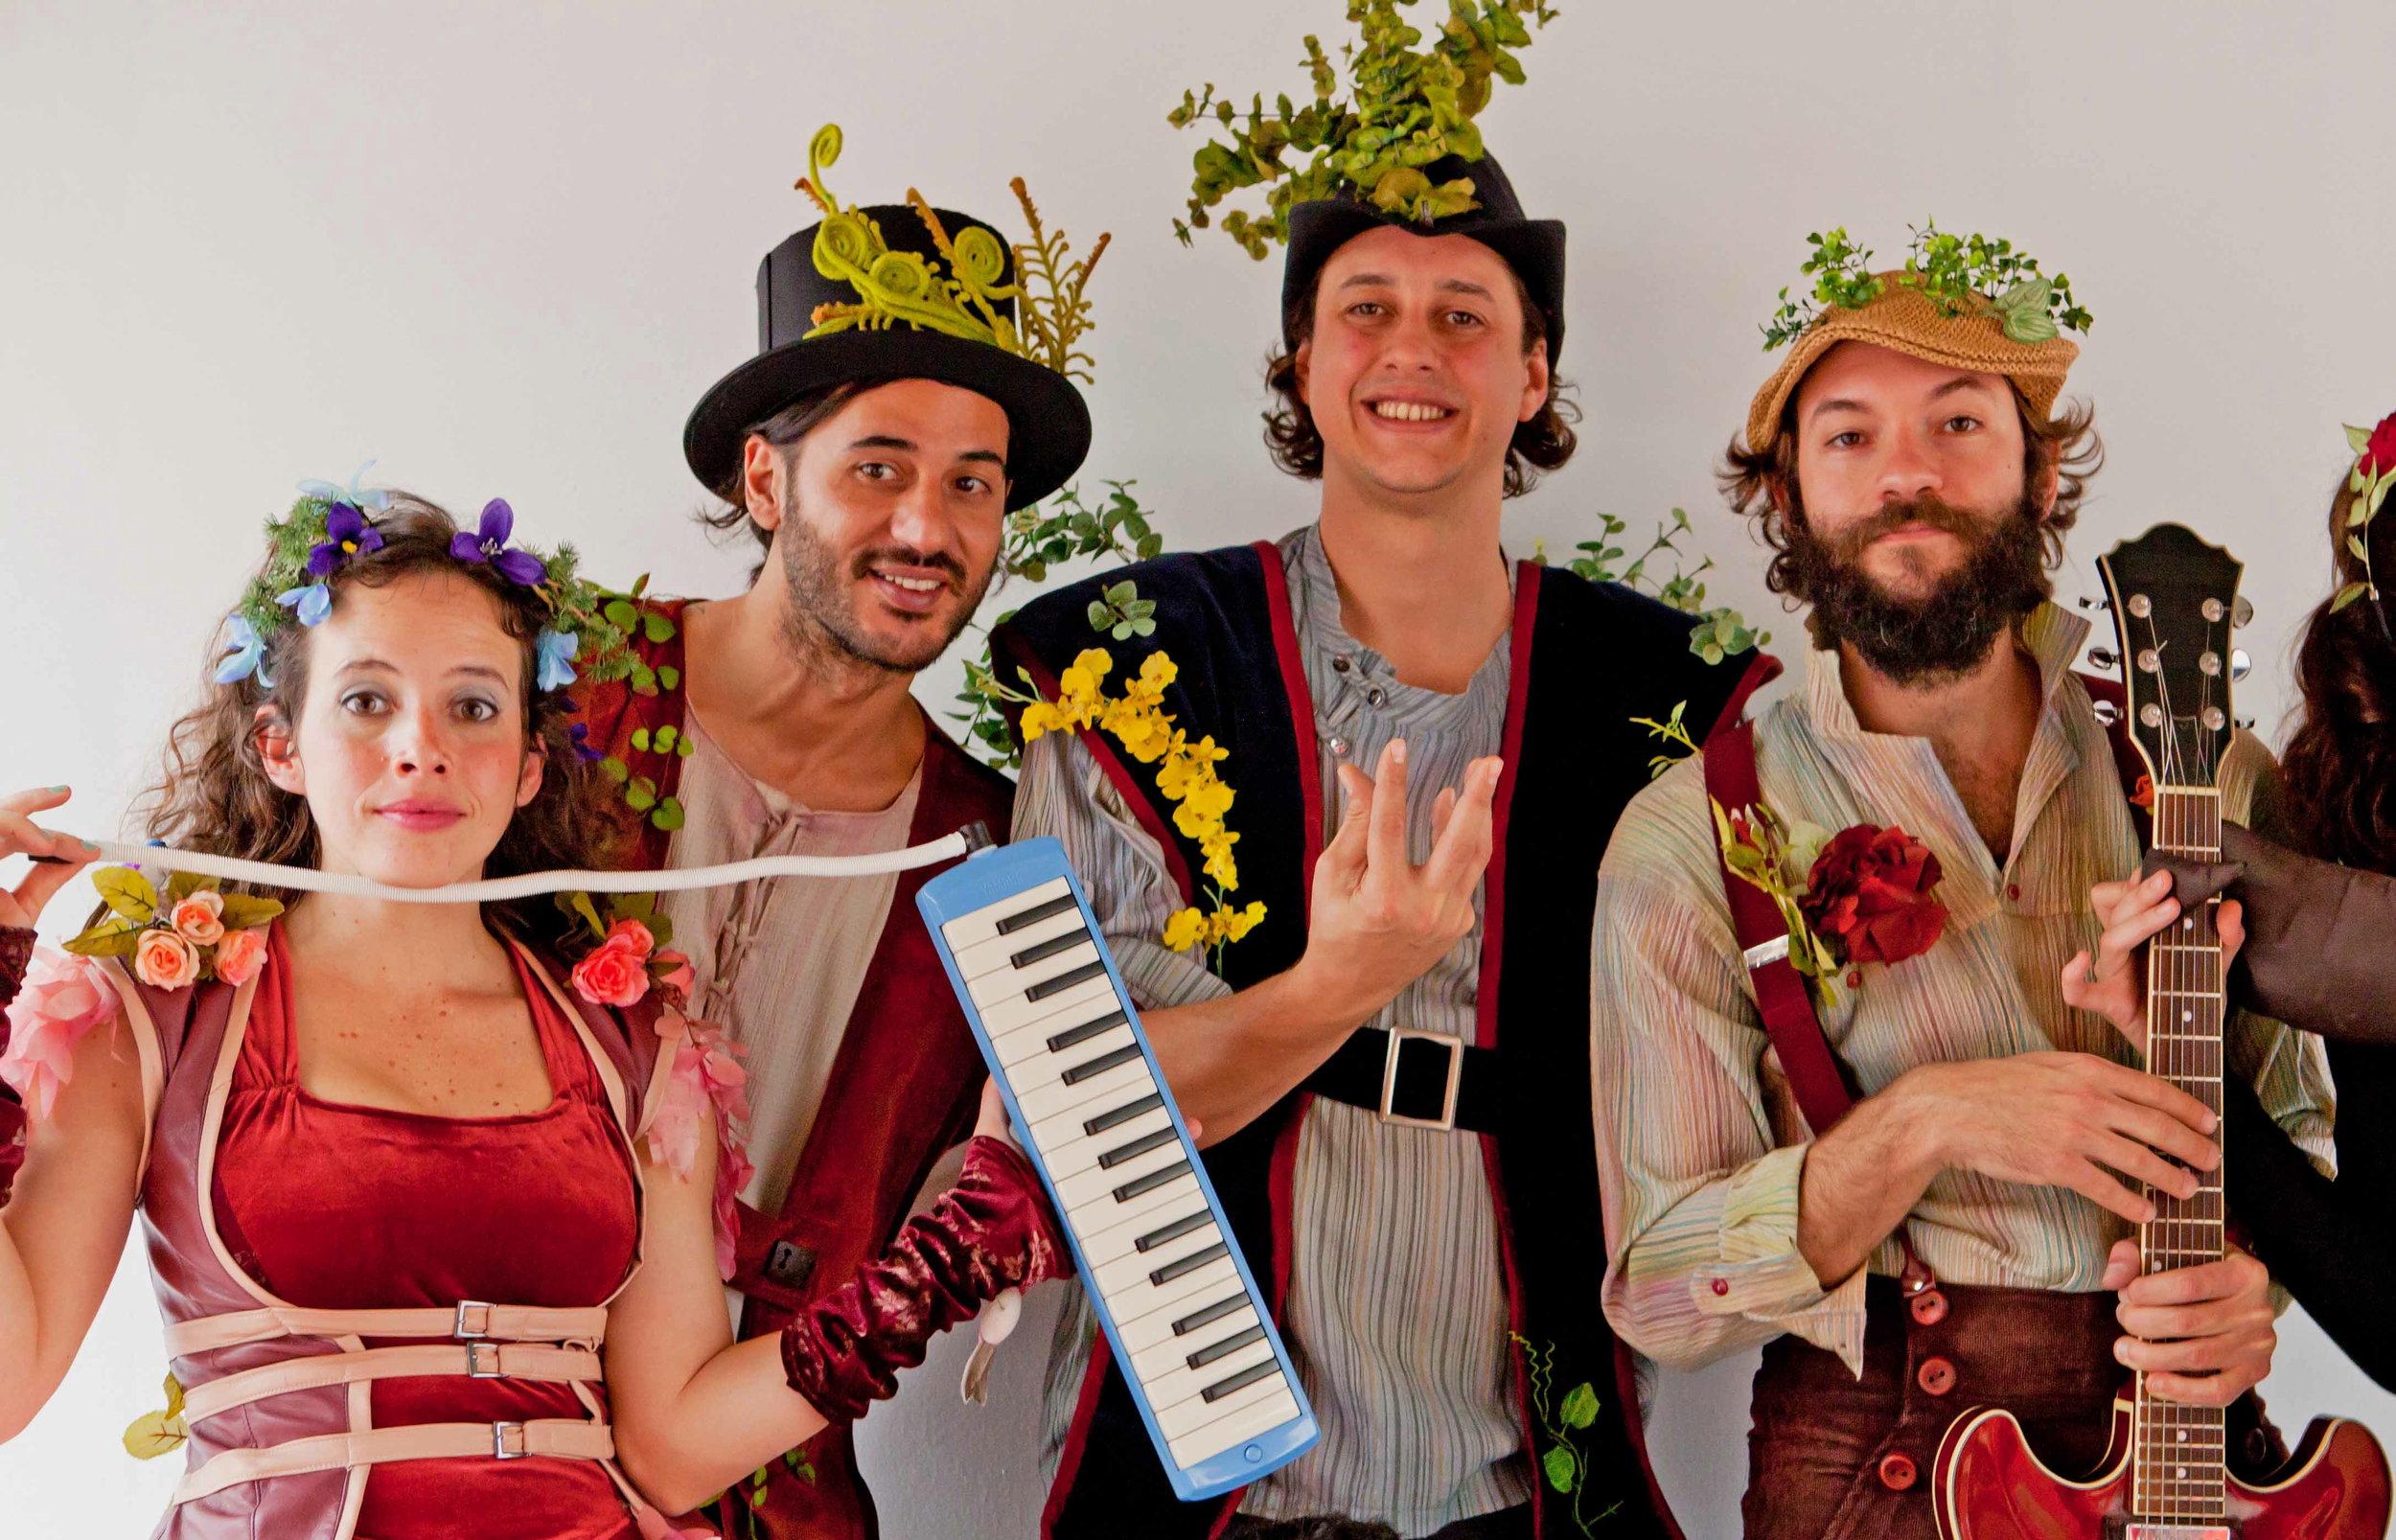 Quarteto_bichos1_DianaBasei.jpg